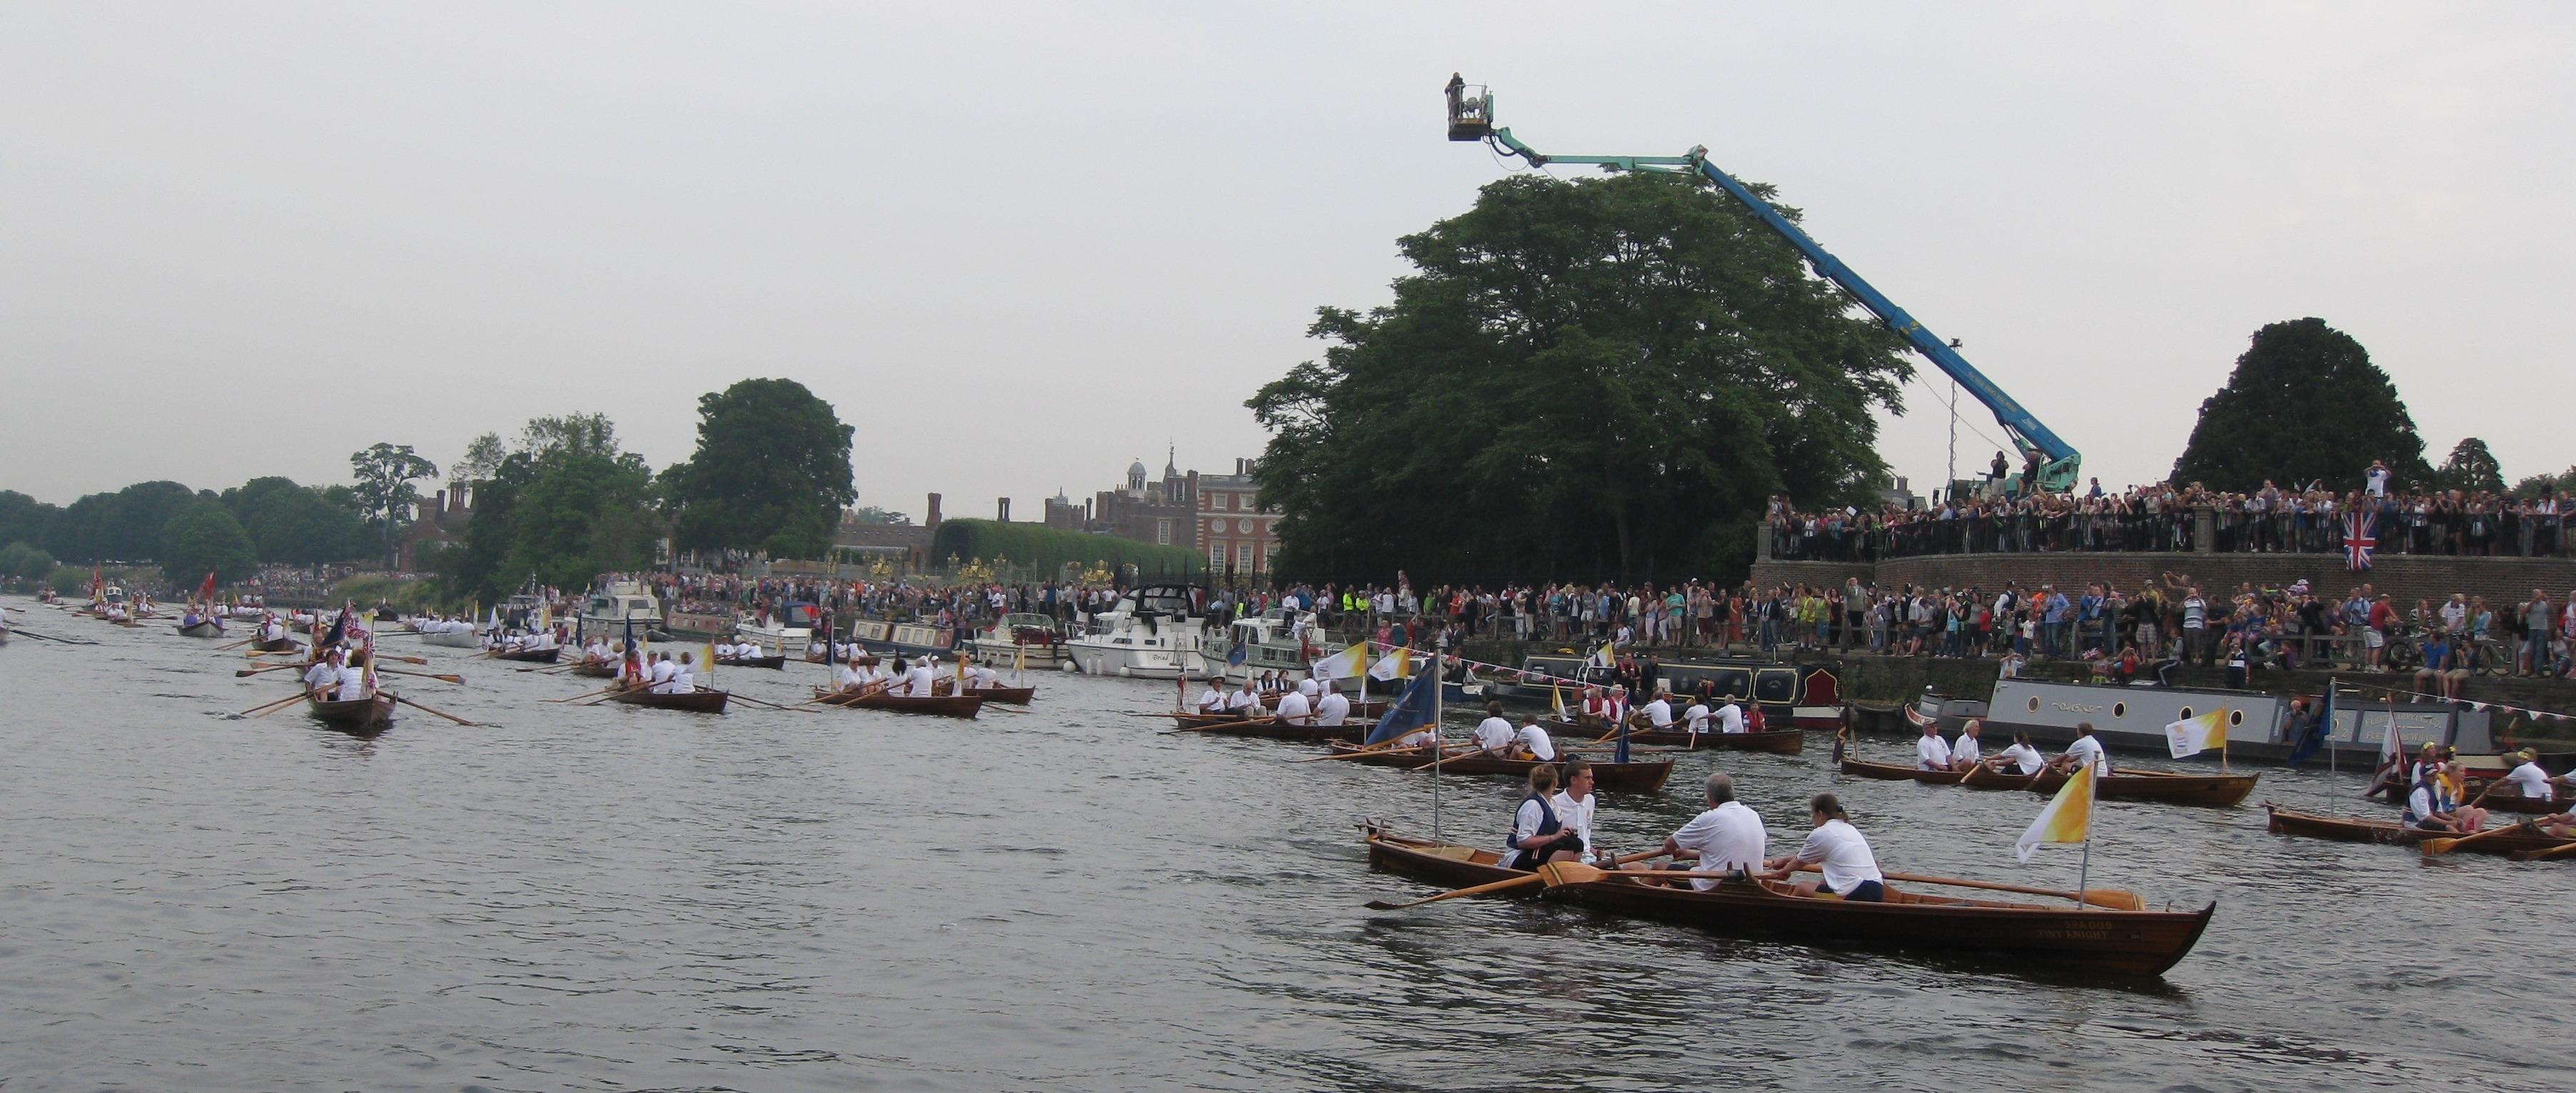 The Hampton Court Palace crowds wave goodbye